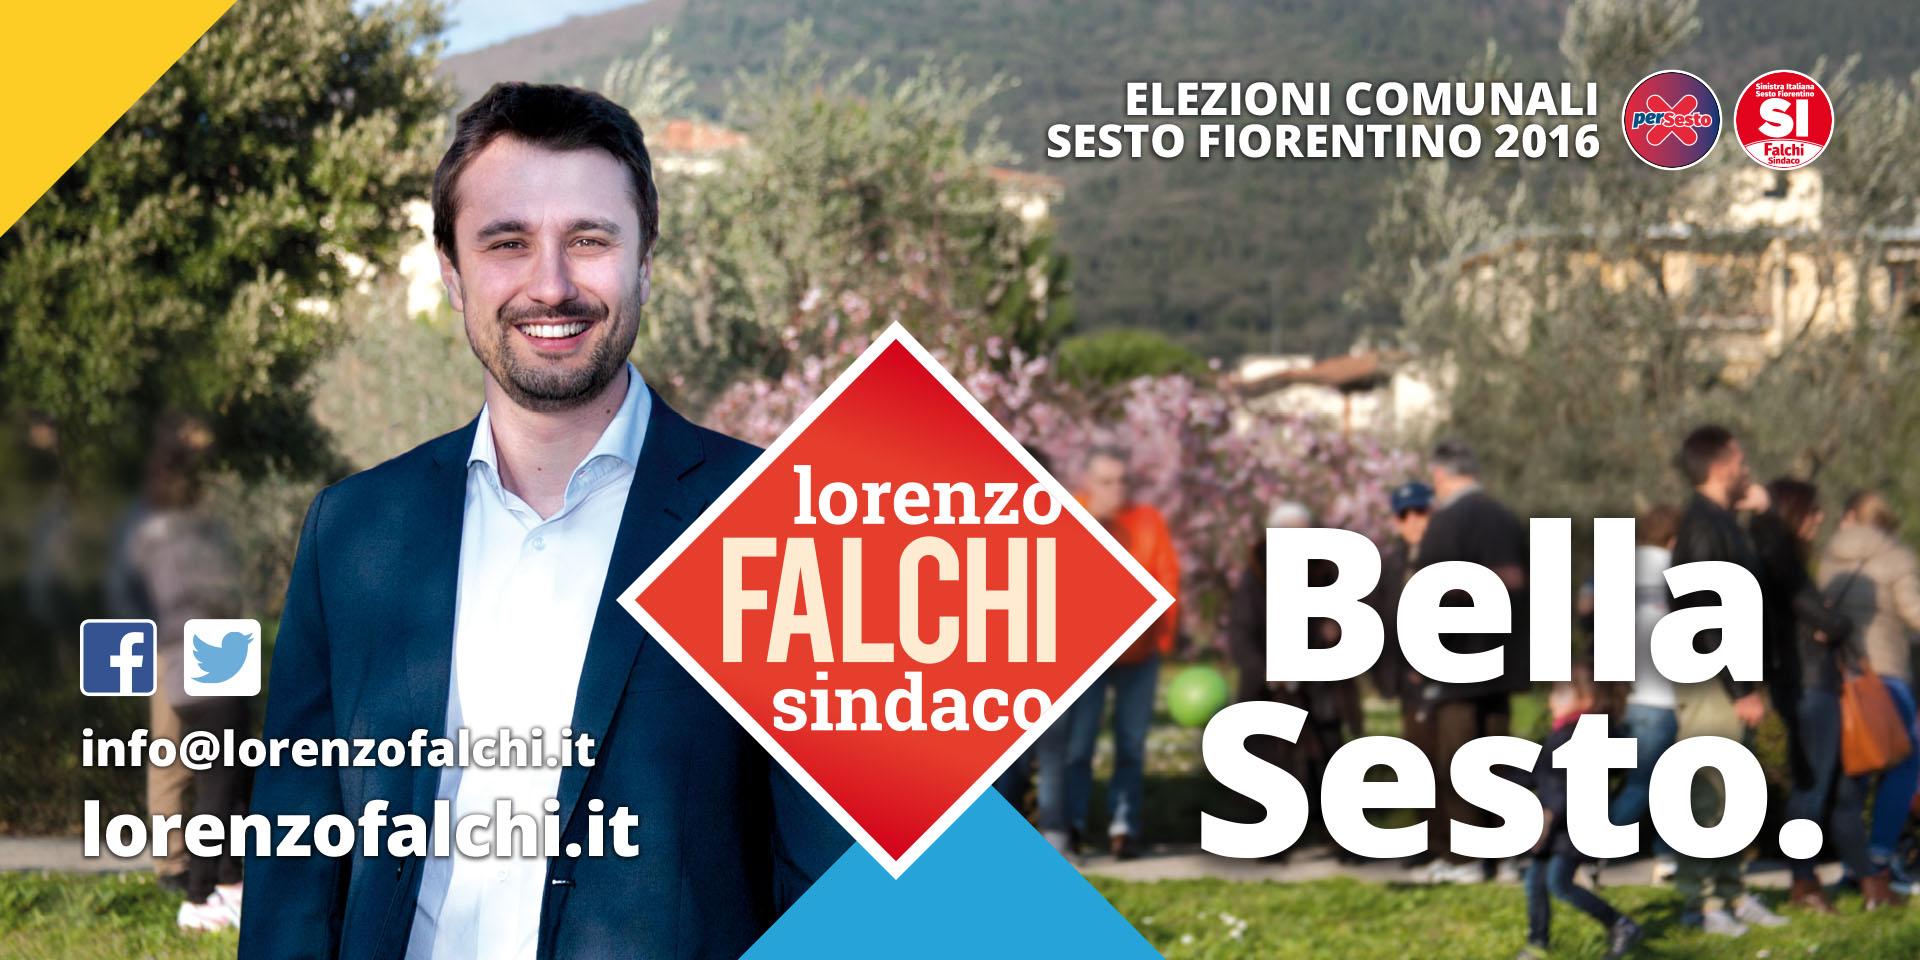 Lorenzo Falchi | Manifesto 6x3 m